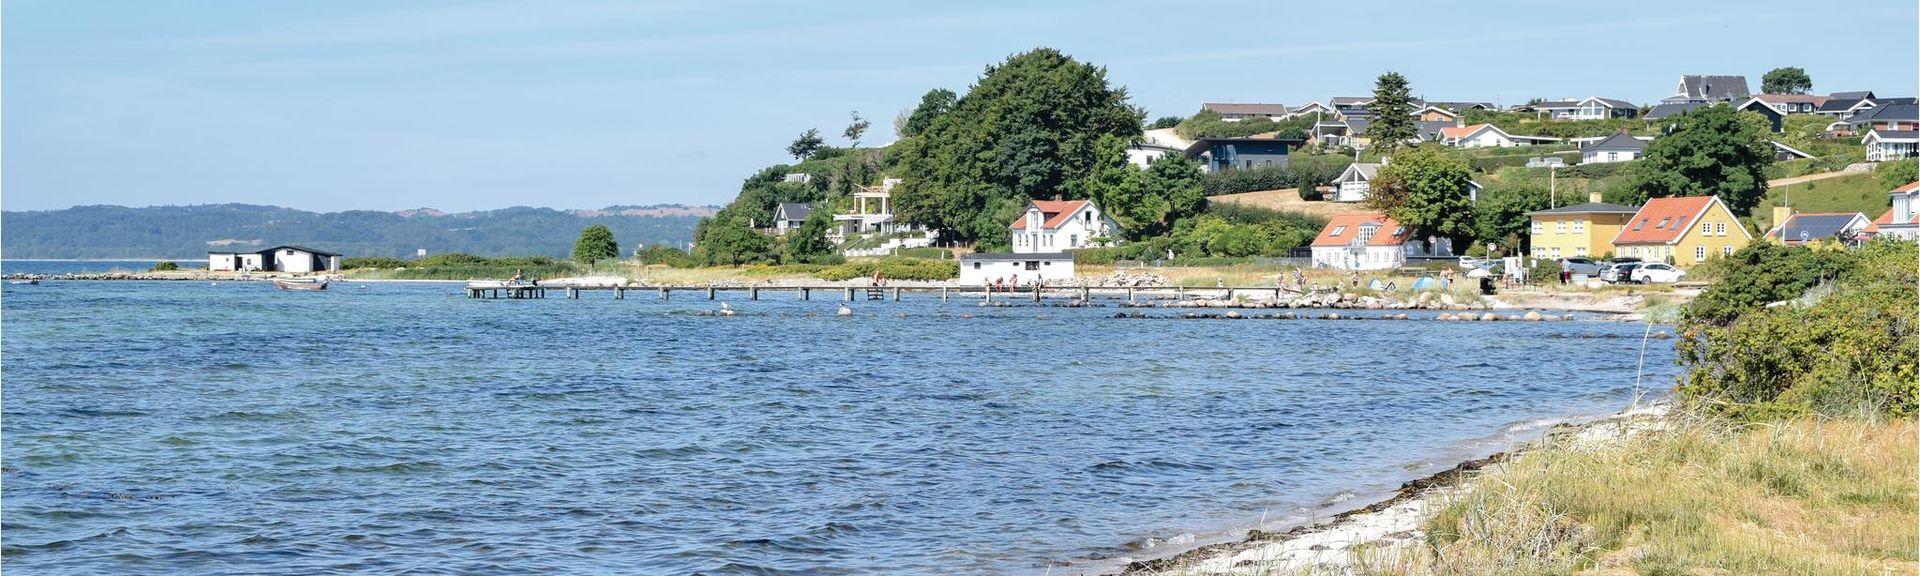 Vibæk Strand, Ebeltoft, Midtjylland (Region), Dänemark